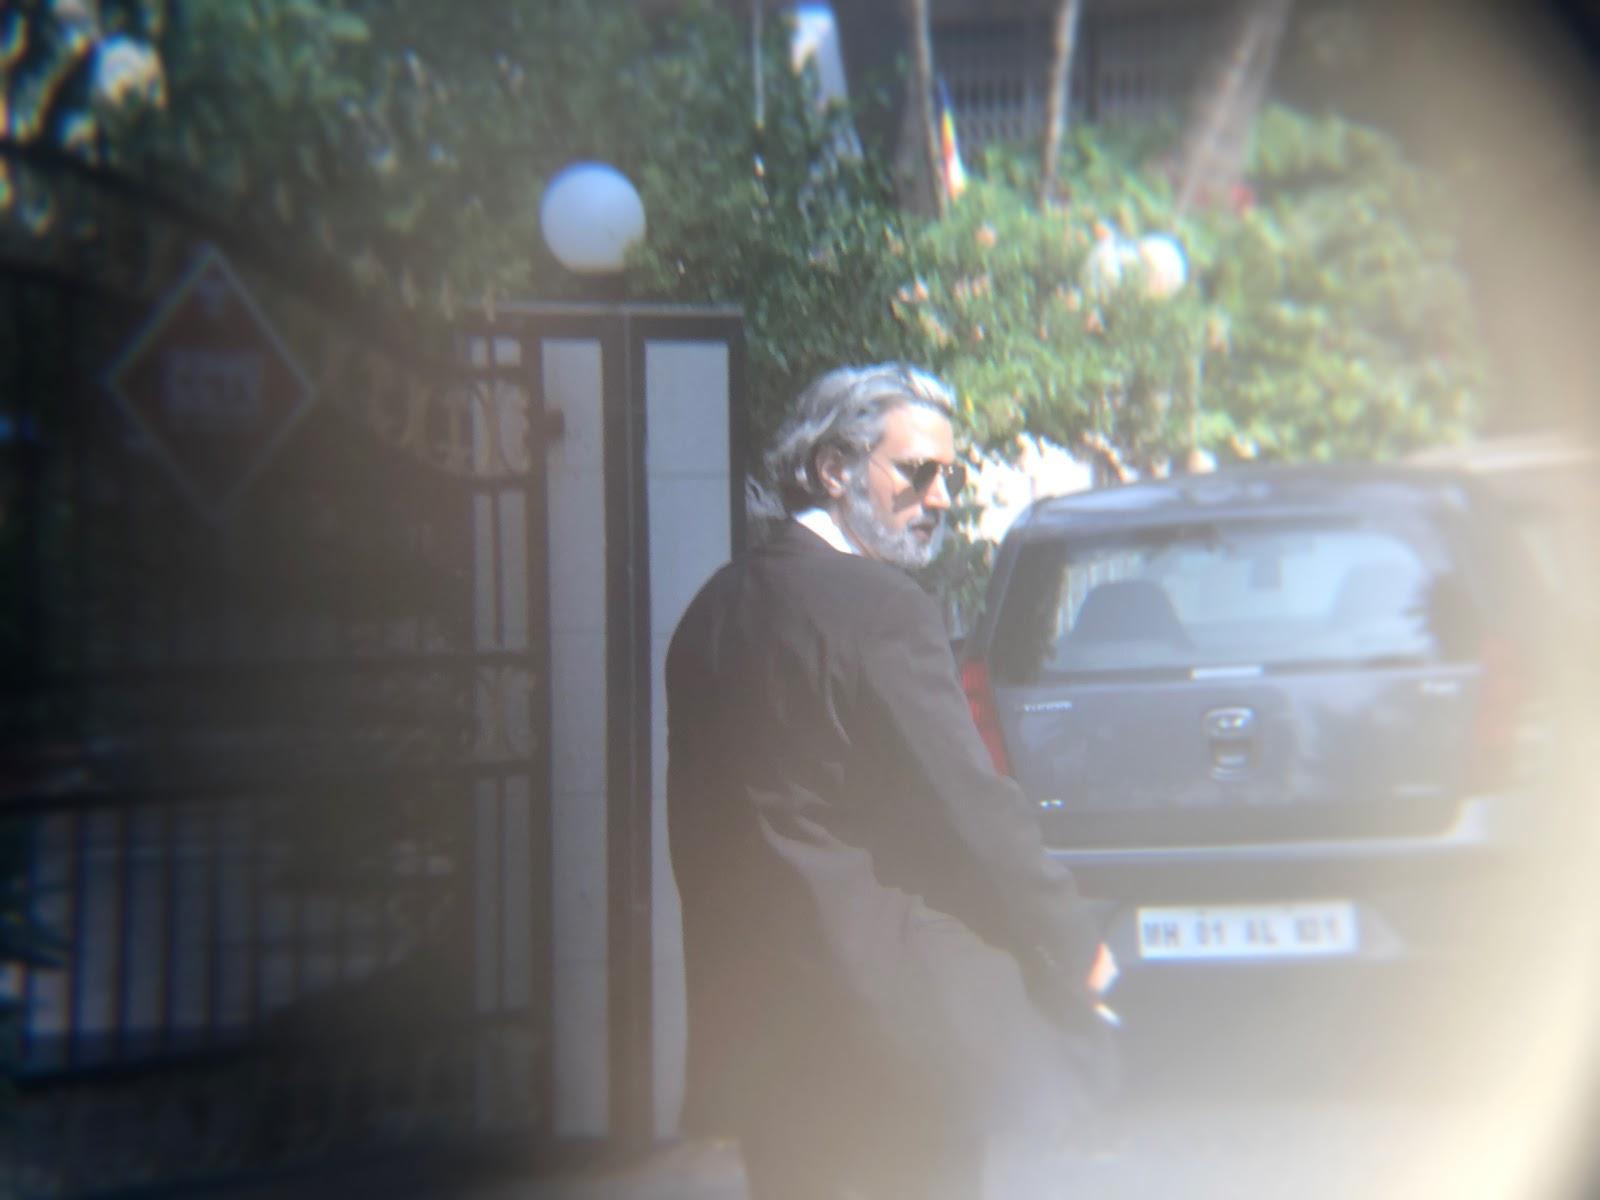 Vijay Mallya supposedly was seen in Bandra, Mumbai earlier this week